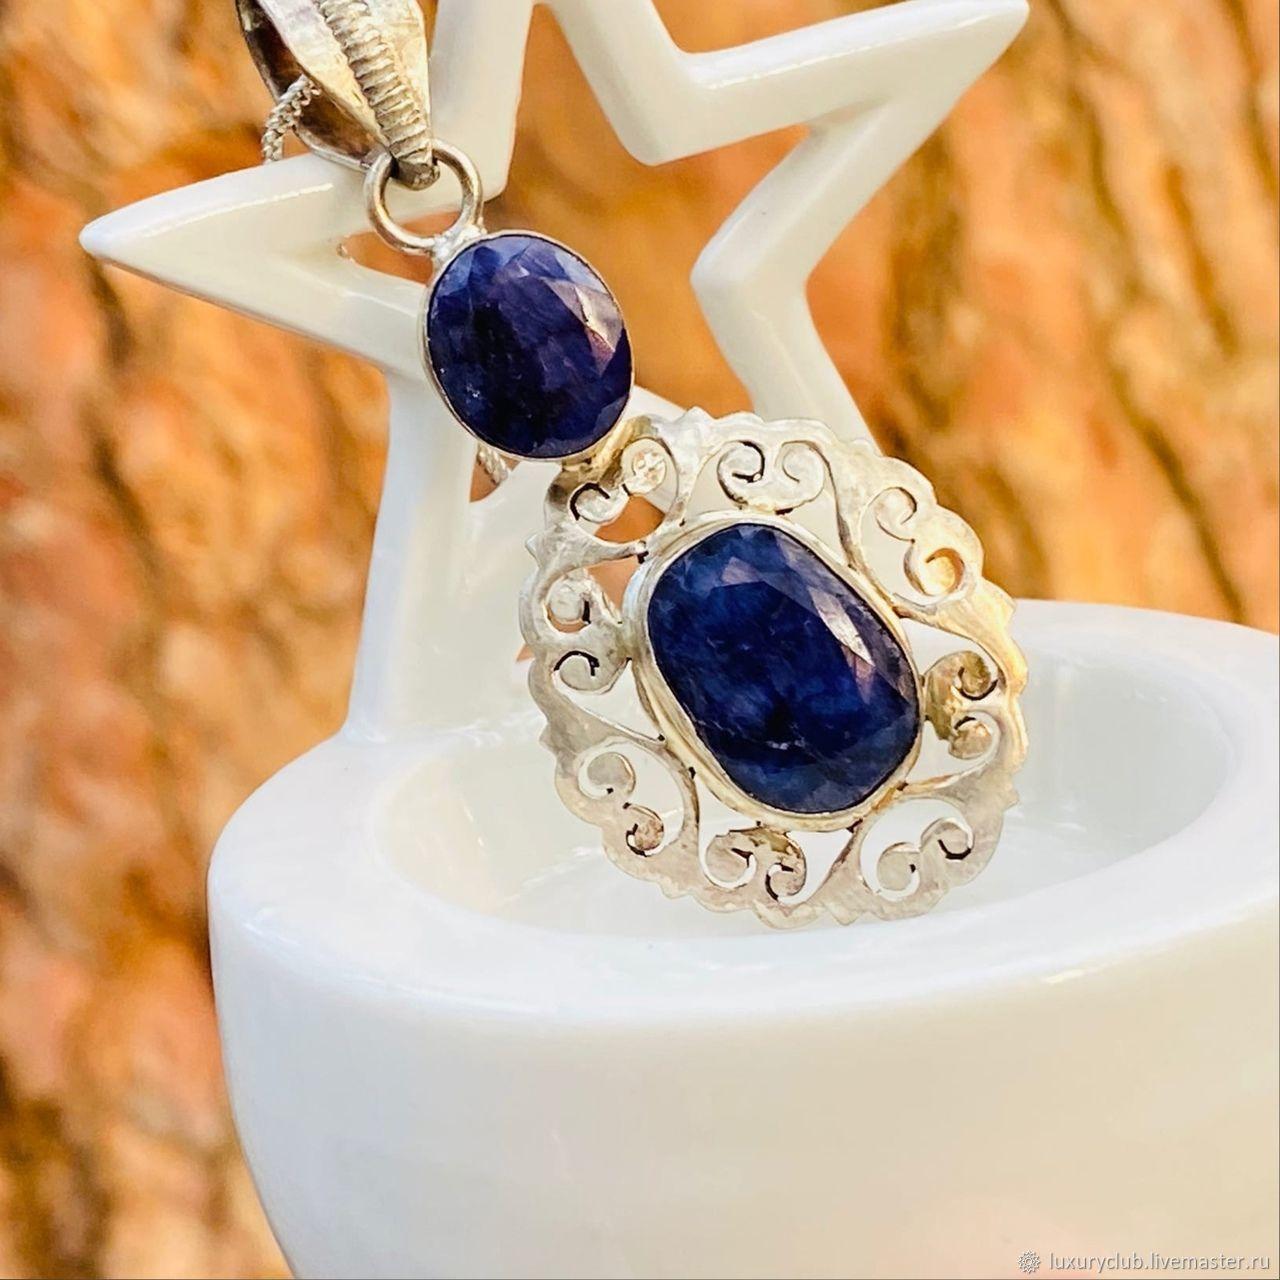 Silver pendant with sapphire, Pendants, Tolyatti,  Фото №1